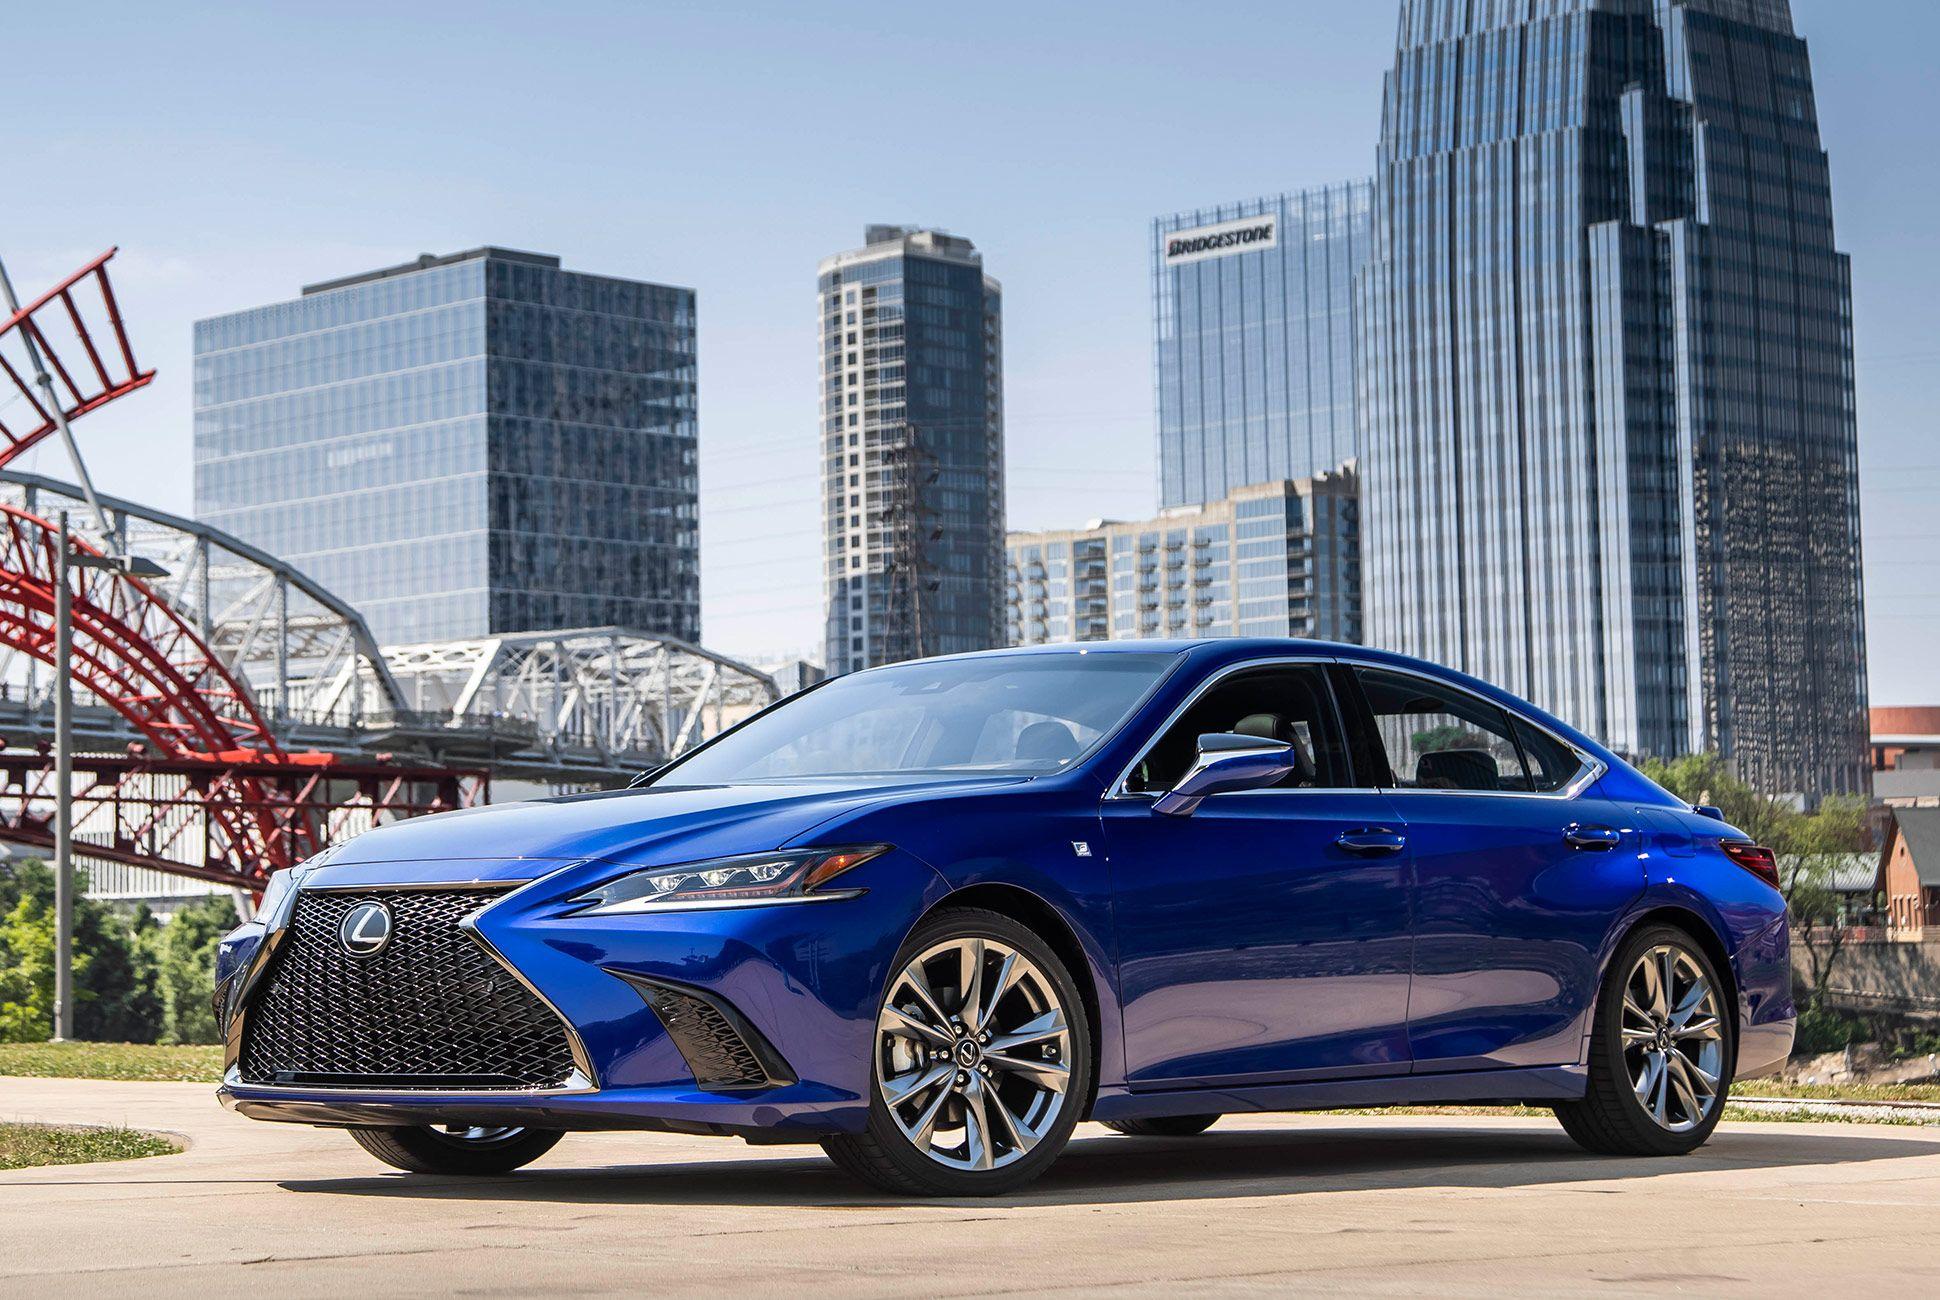 2019-Lexus-ES-350-F-Sport-Review-gear-patrol-slide-1